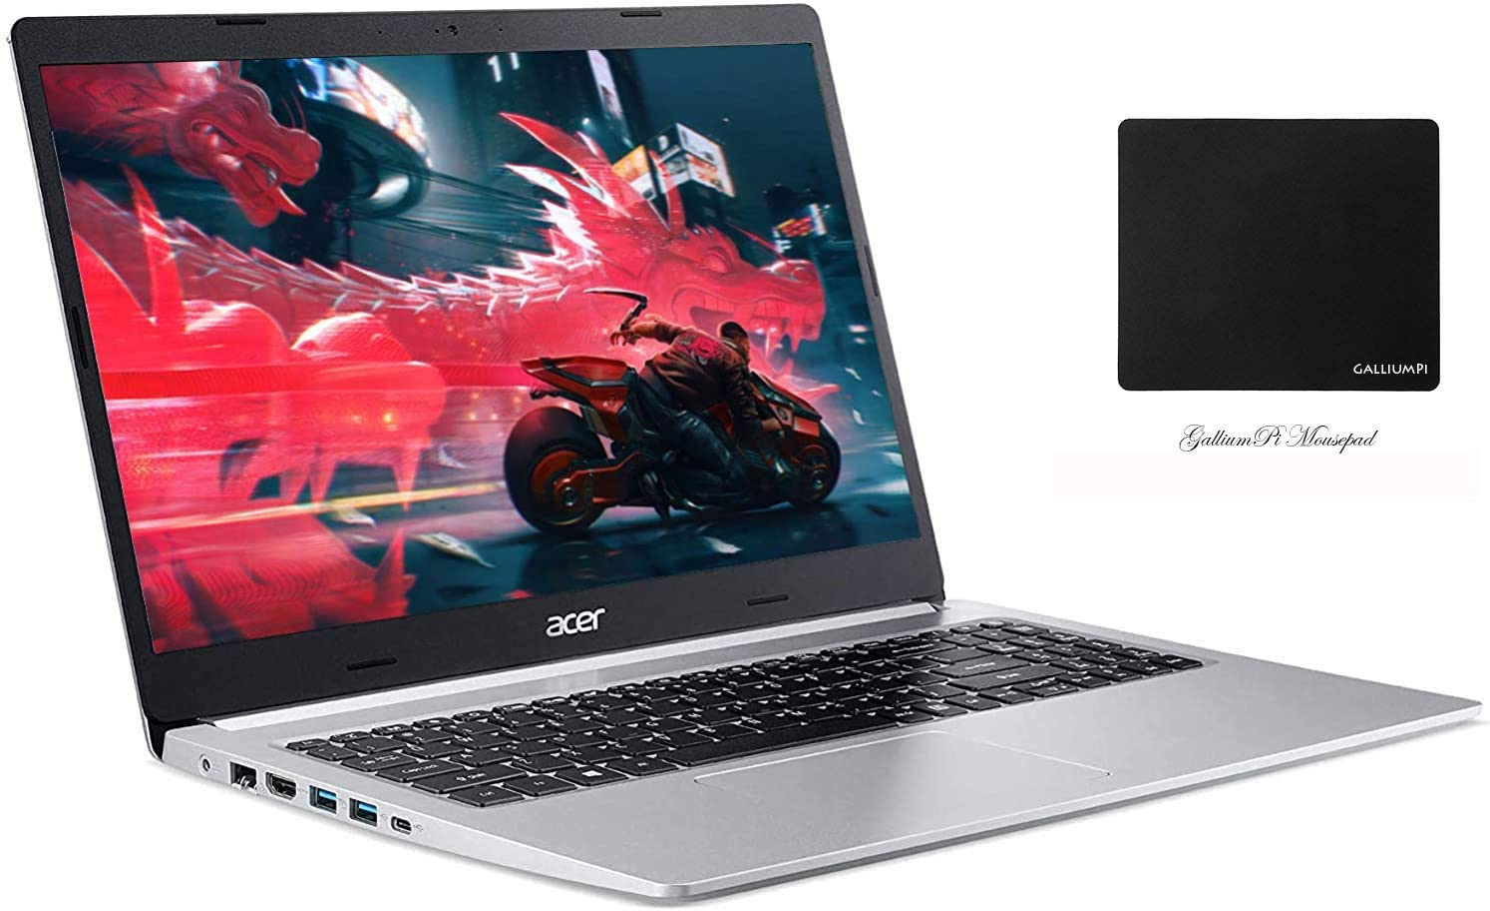 "Newest Acer Aspire 5 15.6"" FHD Laptop, 10th Gen Intel Core i3-1005G1, 8GB DDR4 RAM, 128GB PCIe SSD, WiFi 6, Backlit Keyboard, Windows 10 with GalliumPi Accessories"